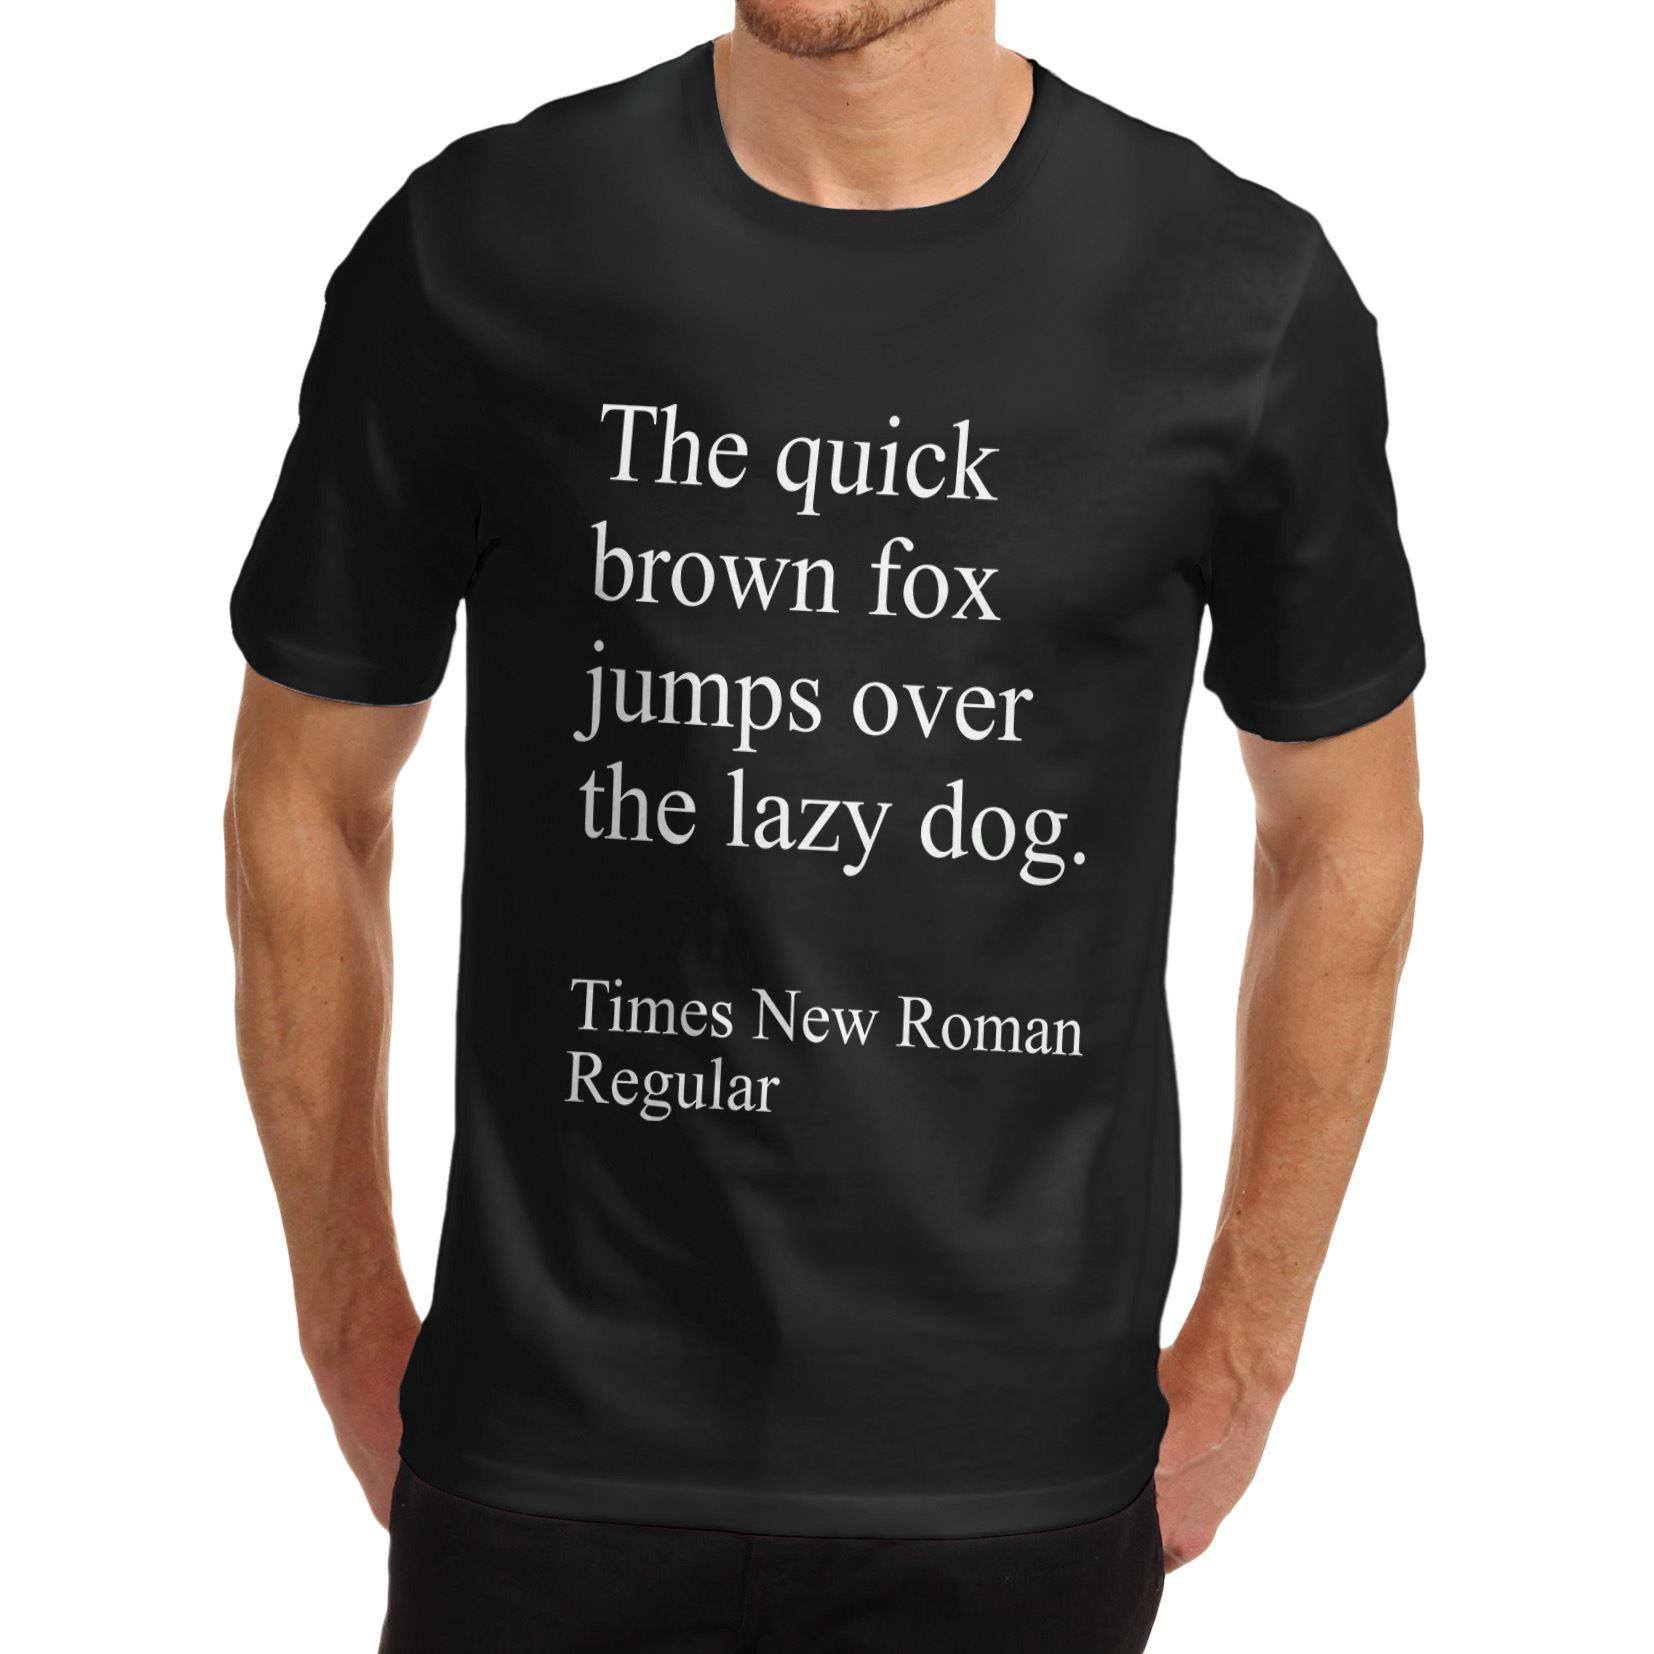 T-shirt design quick - Mens Cotton Funny Gift Design Quick Fox And